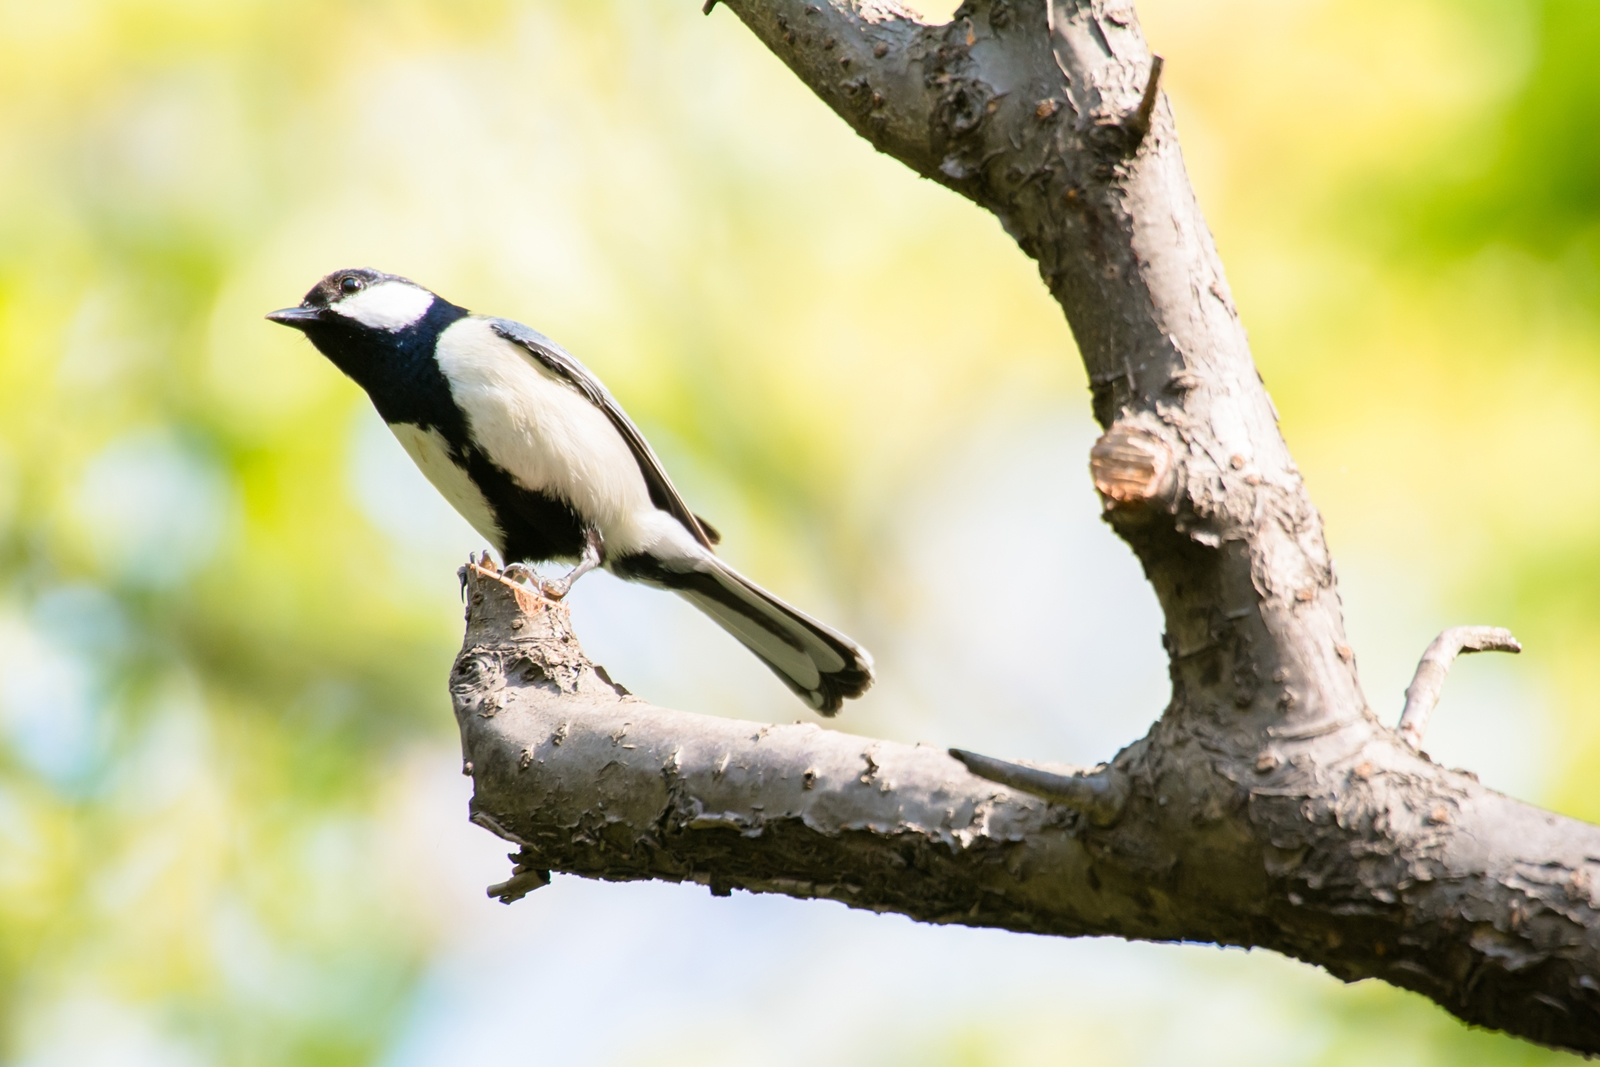 Photo: 萌ゆる光 Shine of sprouting.  森が萌える 眩いばかりの 生命の輝きを放ち 住人達をそっと包み込んでいく  Japanese Tit. (シジュウカラ)  #cooljapan #365cooljapanmay  #birdphotography #birds  #kawaii  Nikon D7100 SIGMA APO 50-500mm F5-6.3 DG OS HSM [ Day350, April 27th ]  小鳥の詩朗読 https://youtu.be/spAavDEW8JA?list=PL2YtHGm0-R3qVsaqvQe9OYdJFCkI98wzF